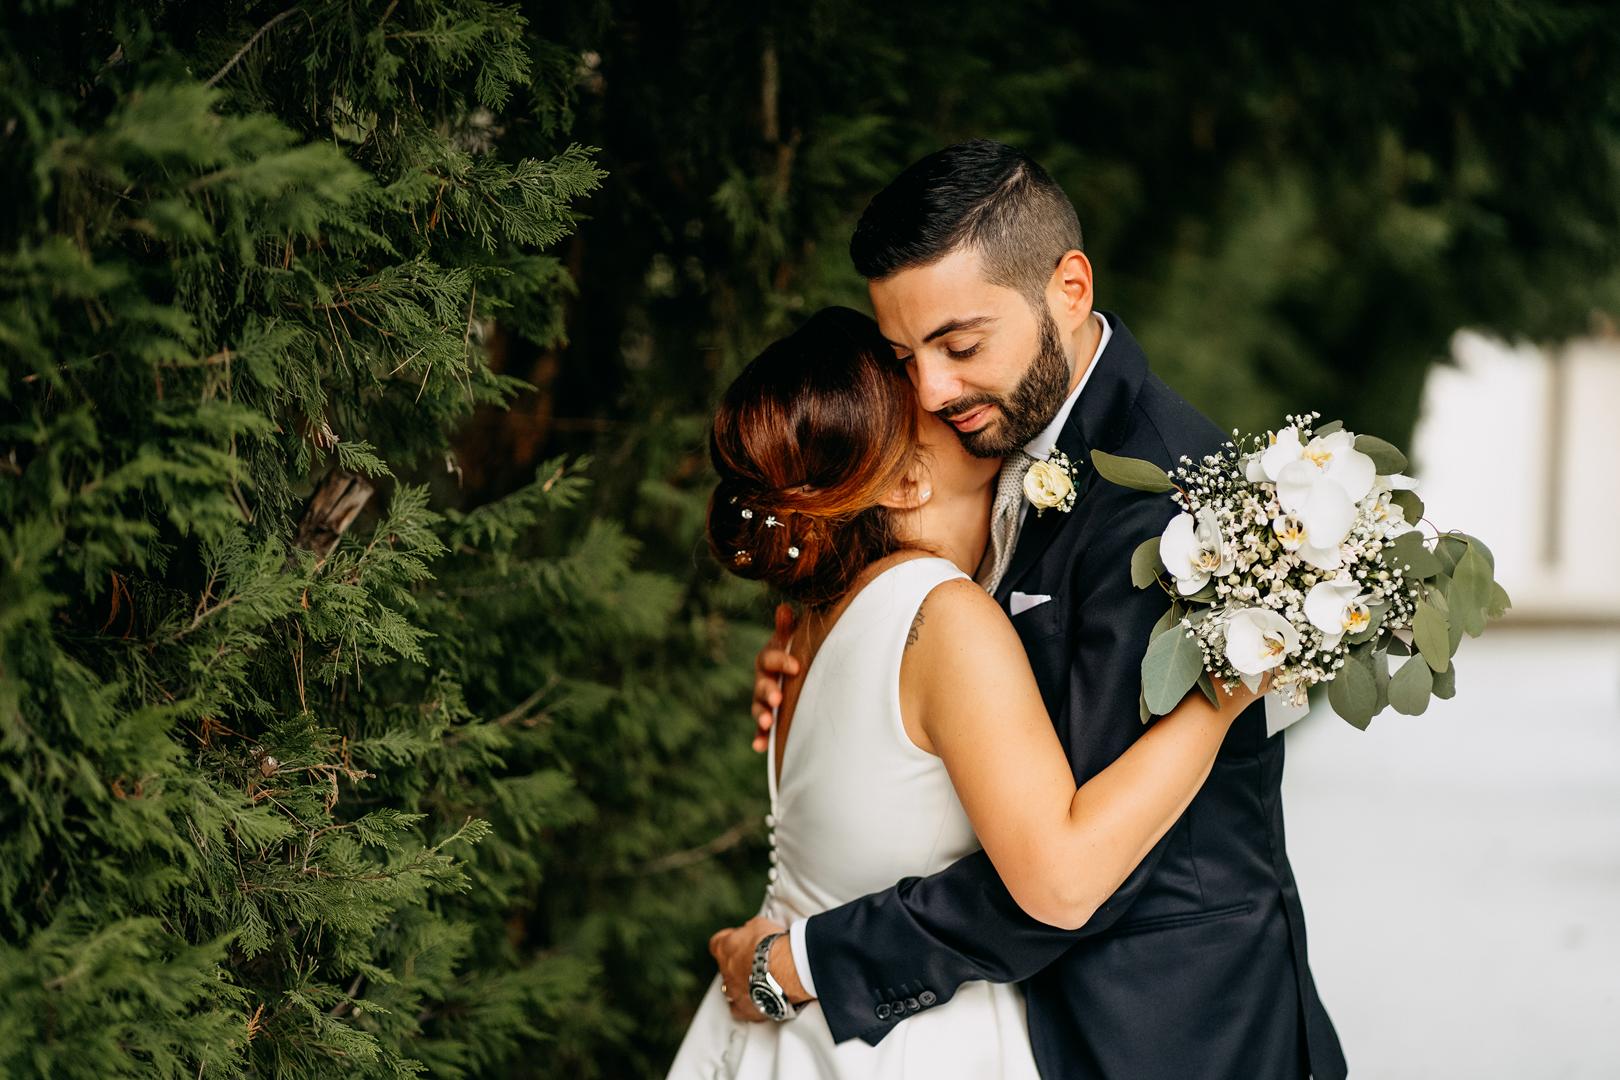 72 gianni lepore-sposi-abbraccio-esterna